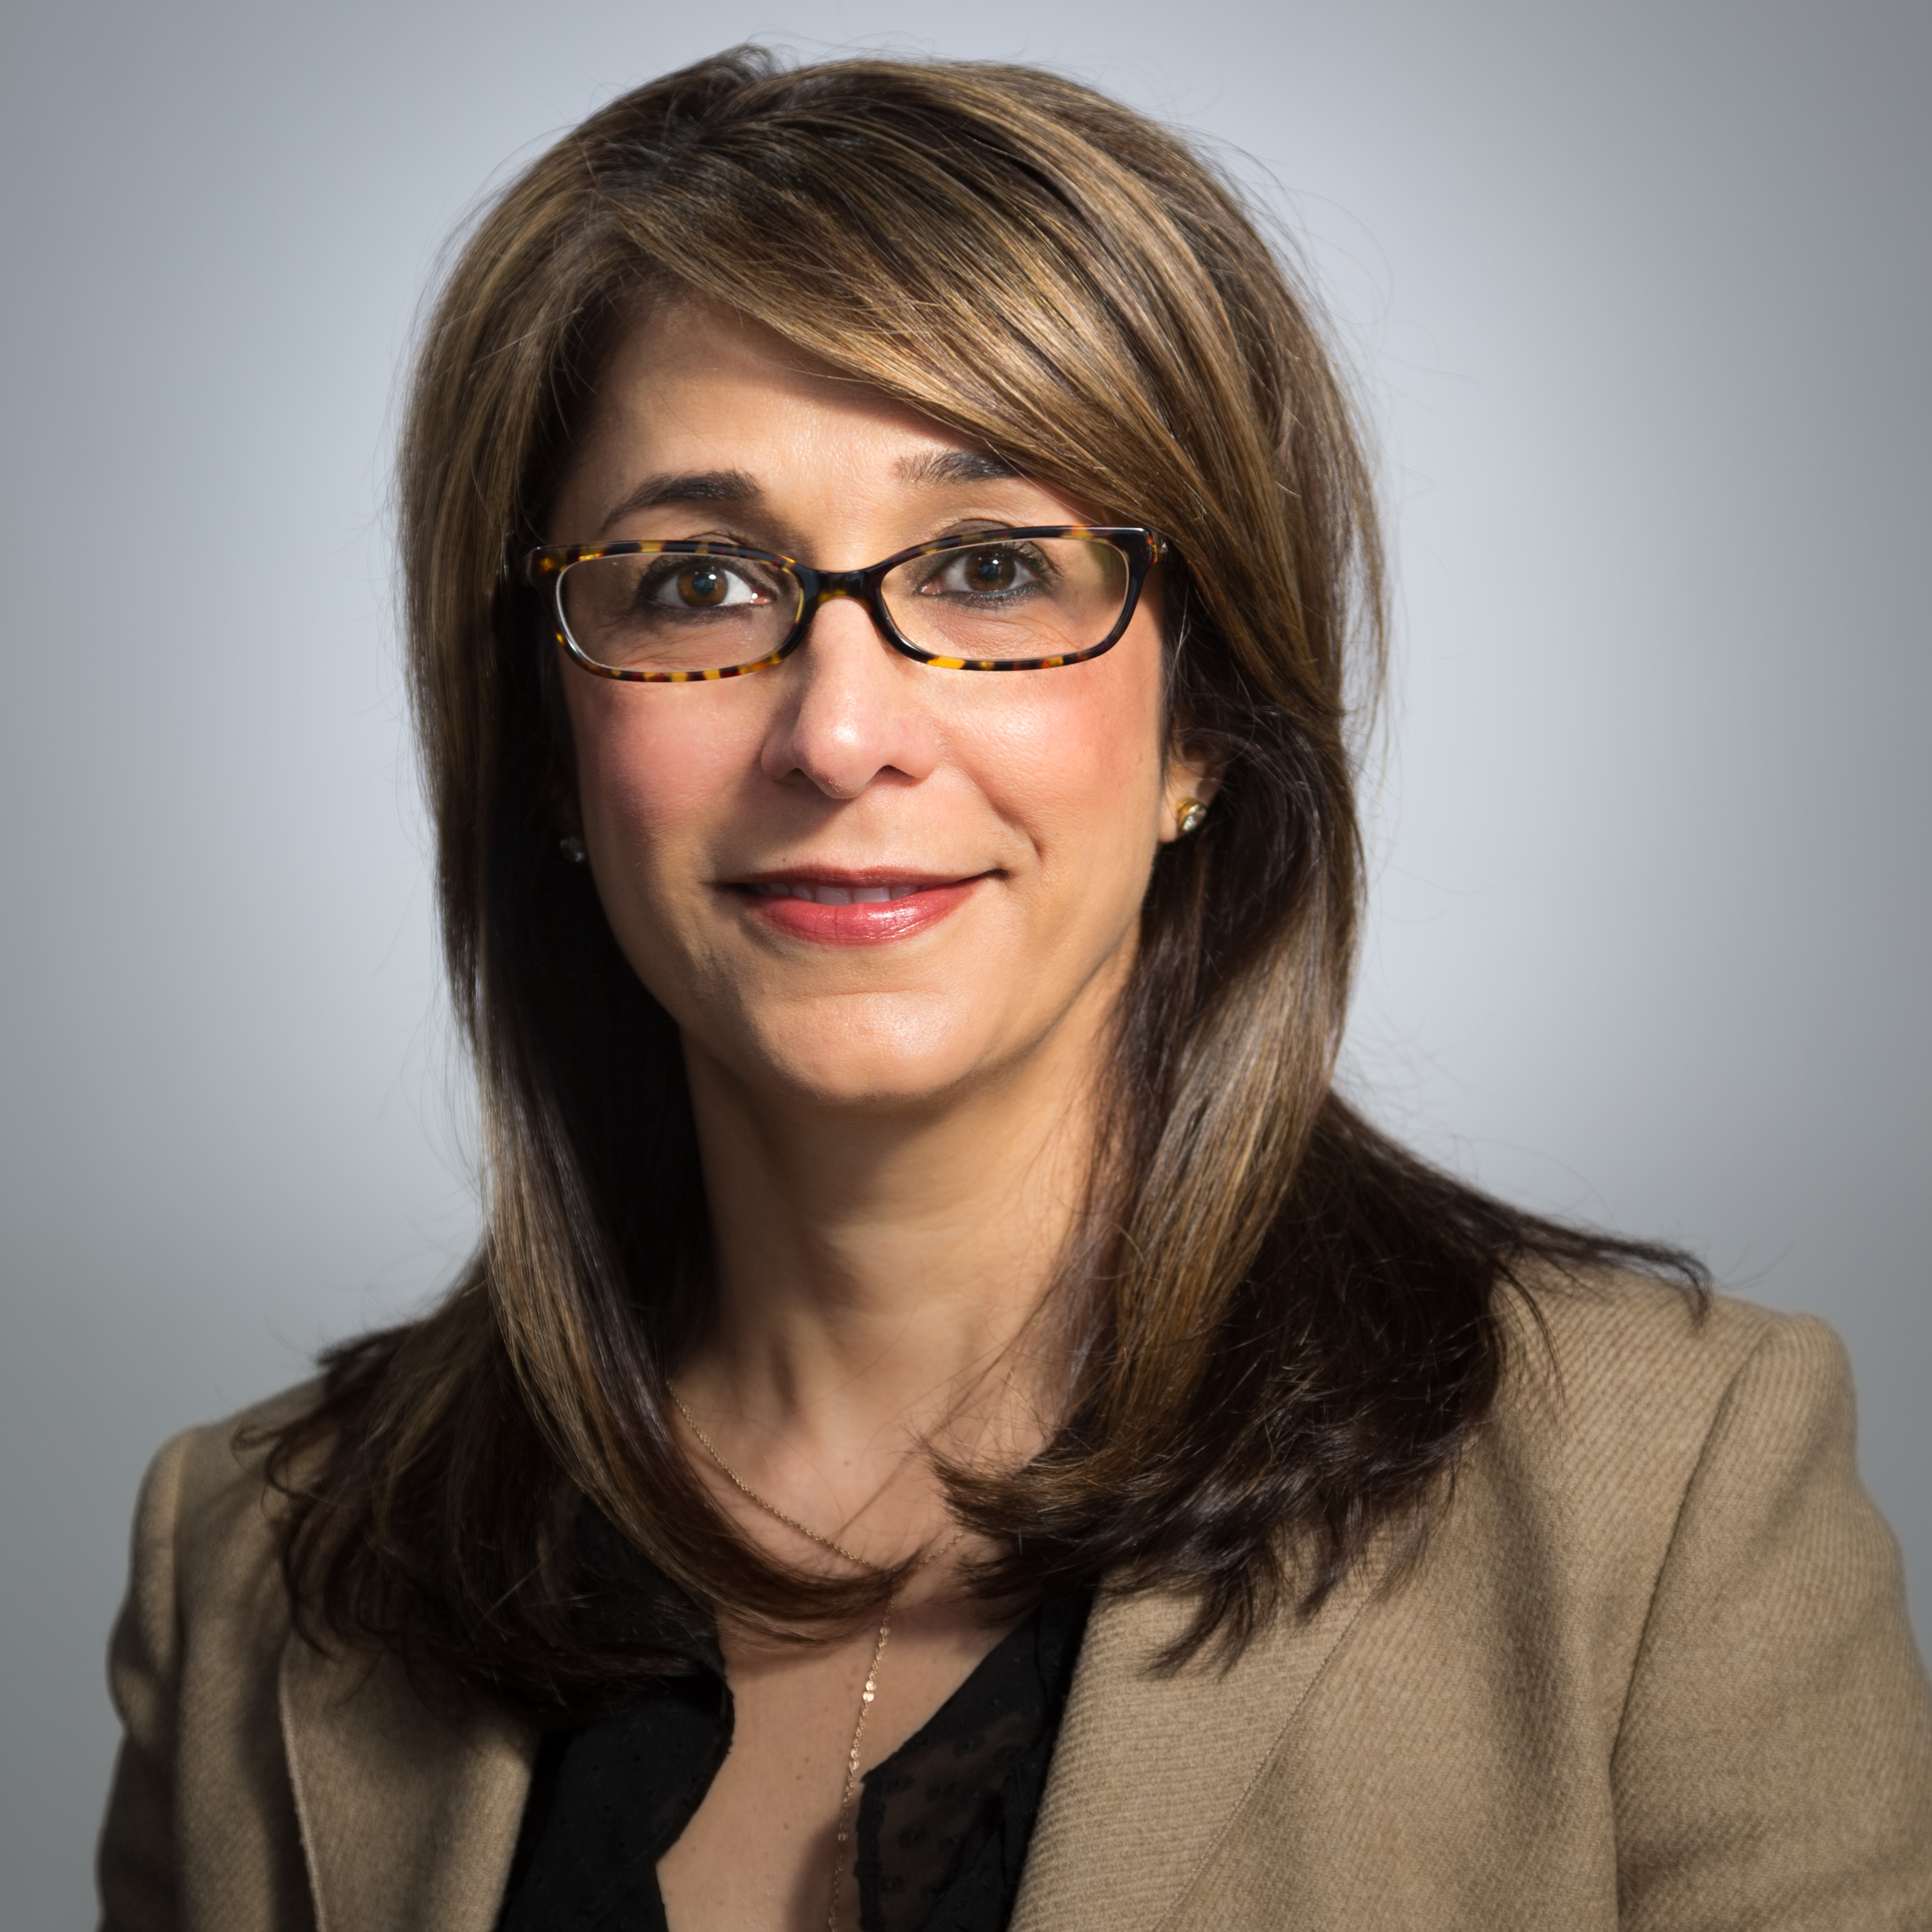 Hengameh Raissy, vicepresidente de investigación pediátrica